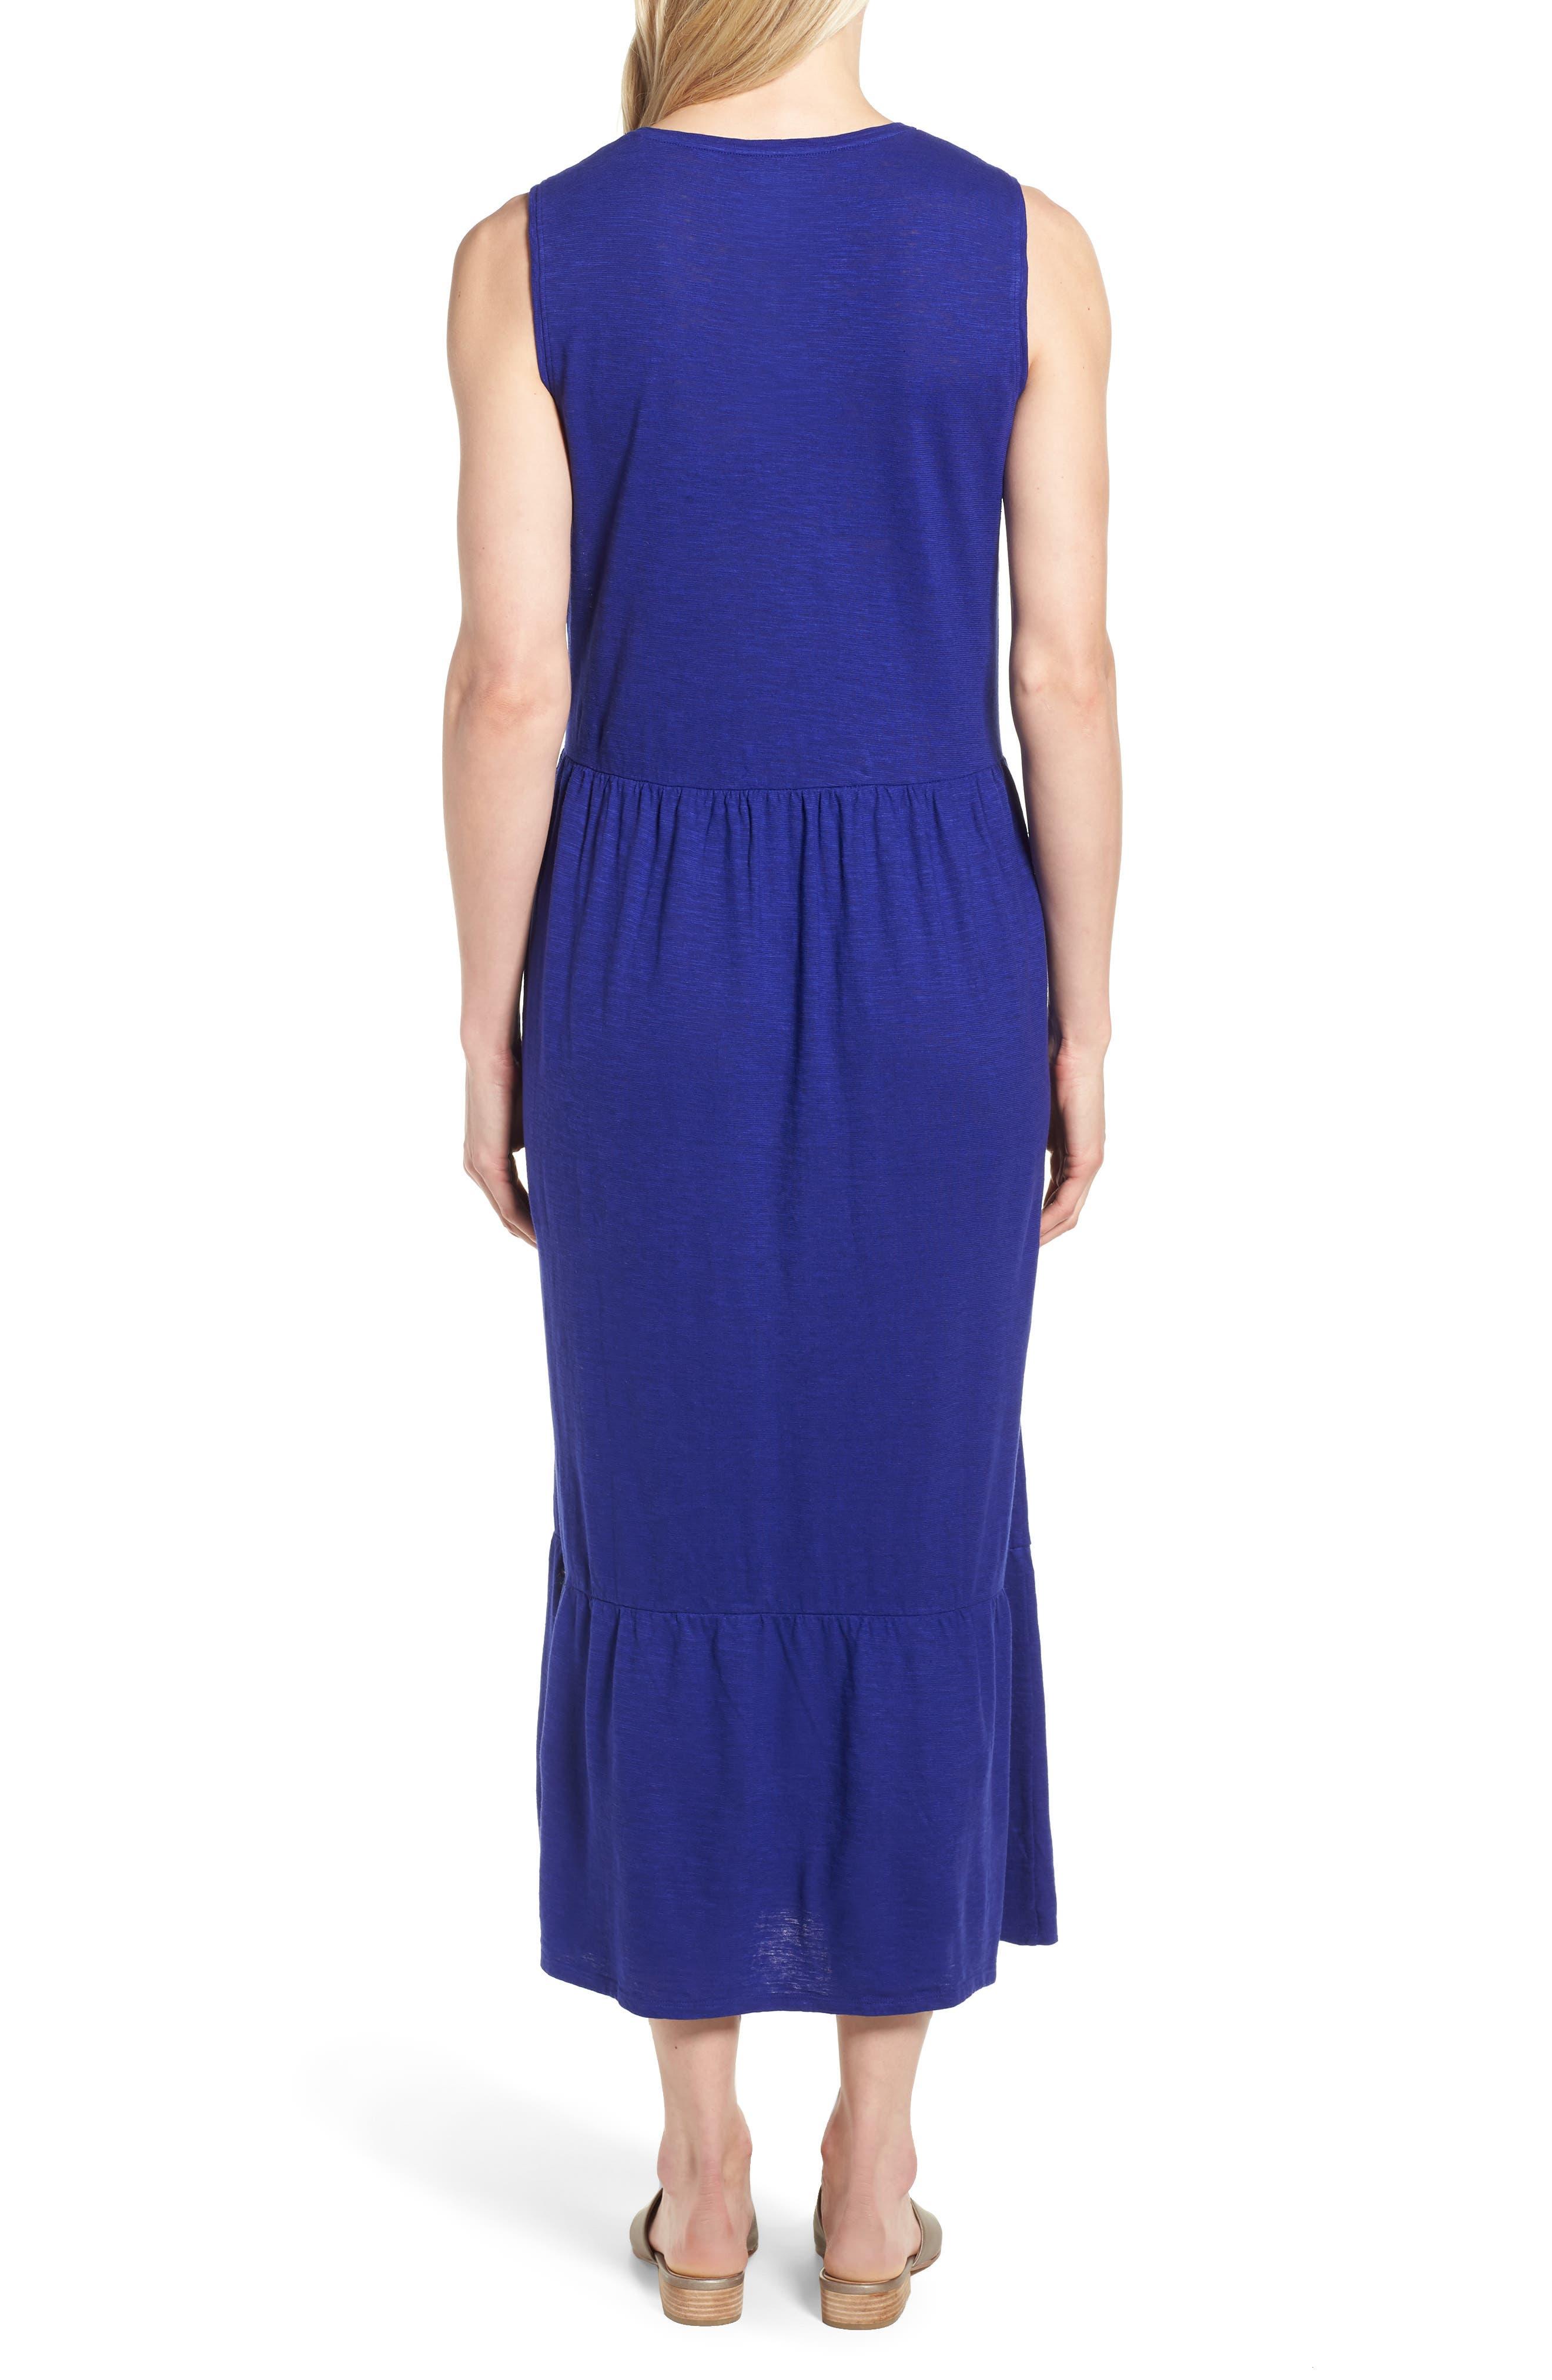 Scooped Neck Hemp & Cotton Midi Dress,                             Alternate thumbnail 2, color,                             Blue Violet